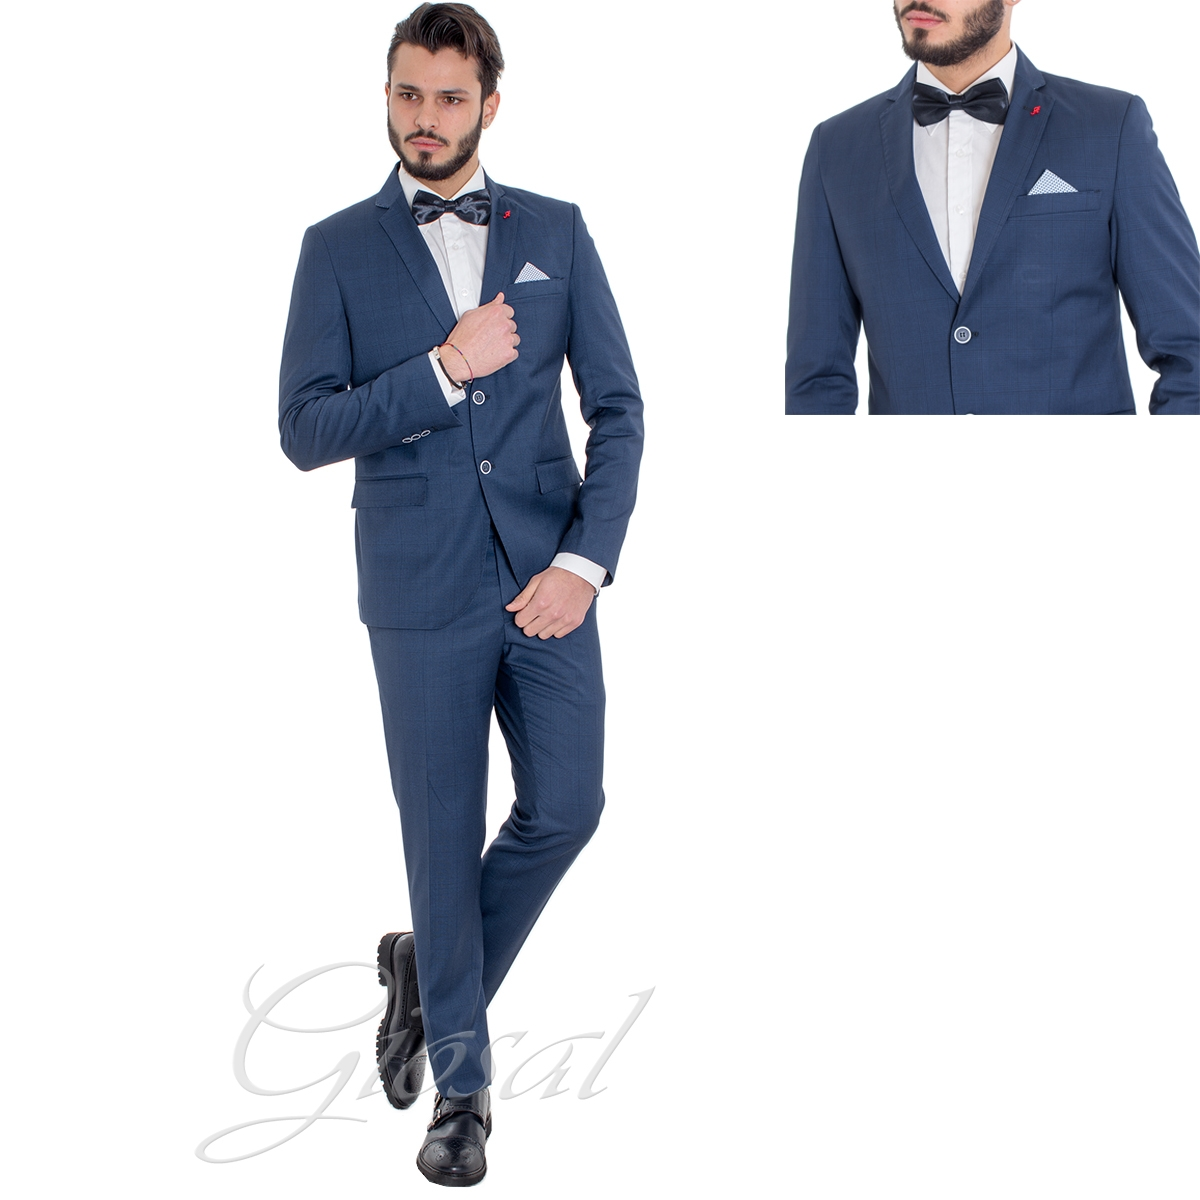 Vestiti Eleganti Blu.Abito Uomo Elegante Completo Blu Royal Quadretti Scozzese Slim